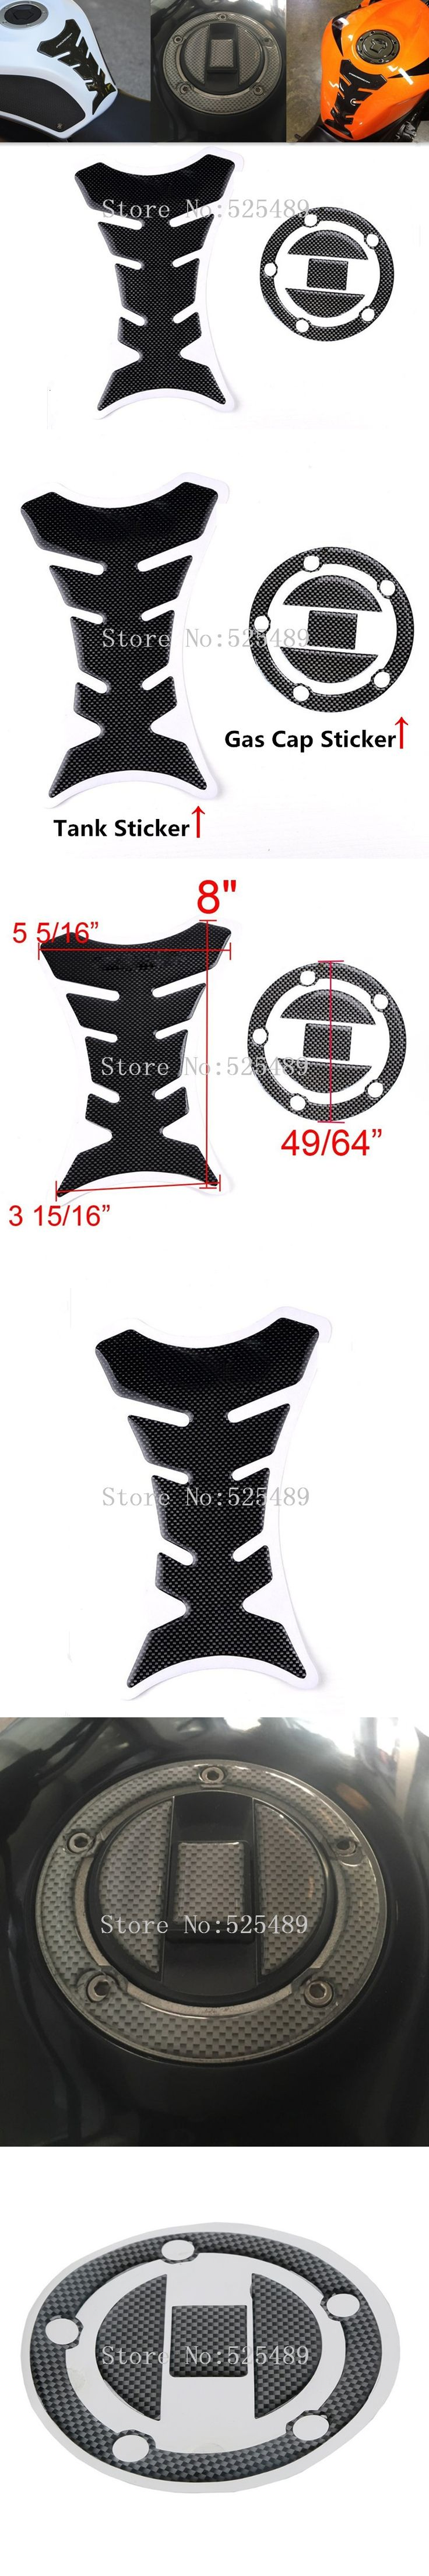 Motorcycle Decoration Sticker Fuel Tank Pad Decals Gas Cap Pad Cover Stickers For Suzuki GSXR 600 750 1000 GSX1300R SV650/1000